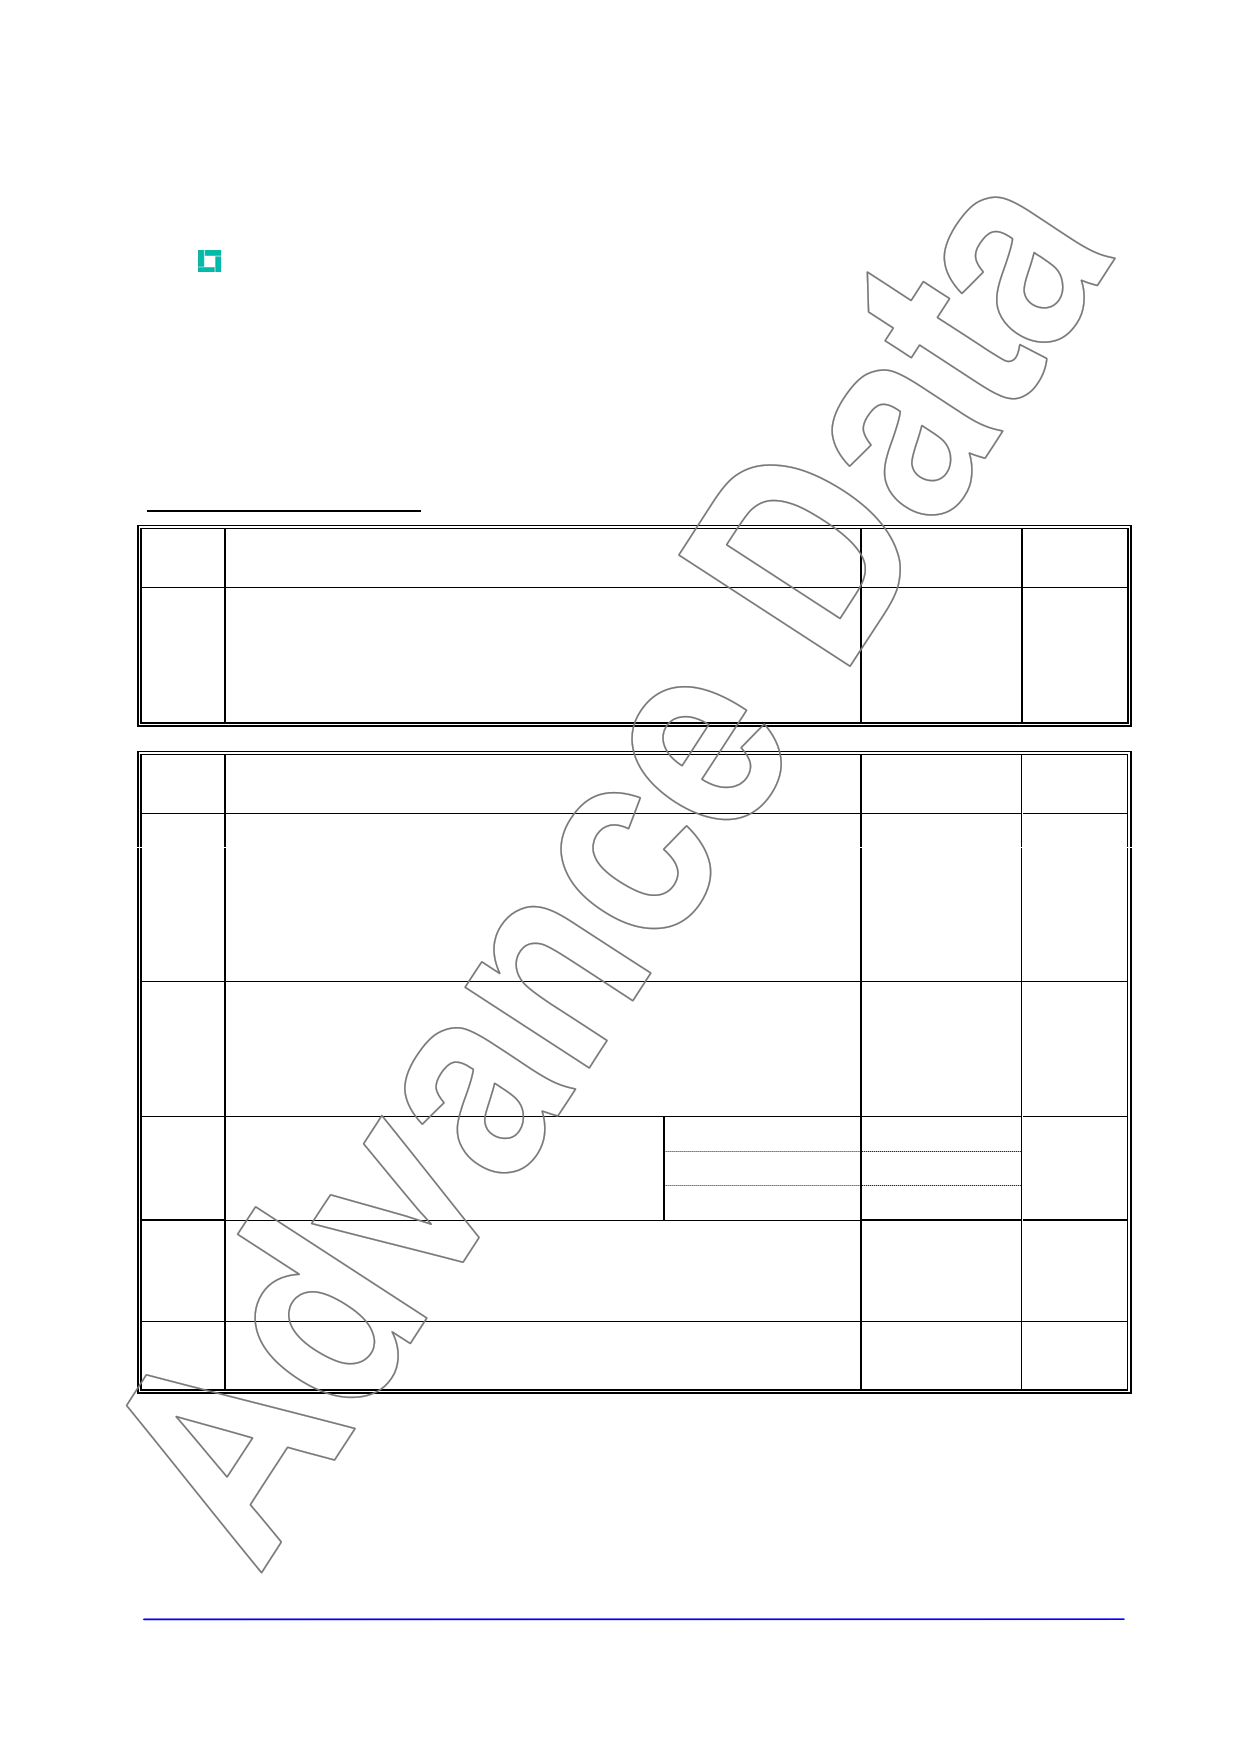 K0620QA650 datasheet